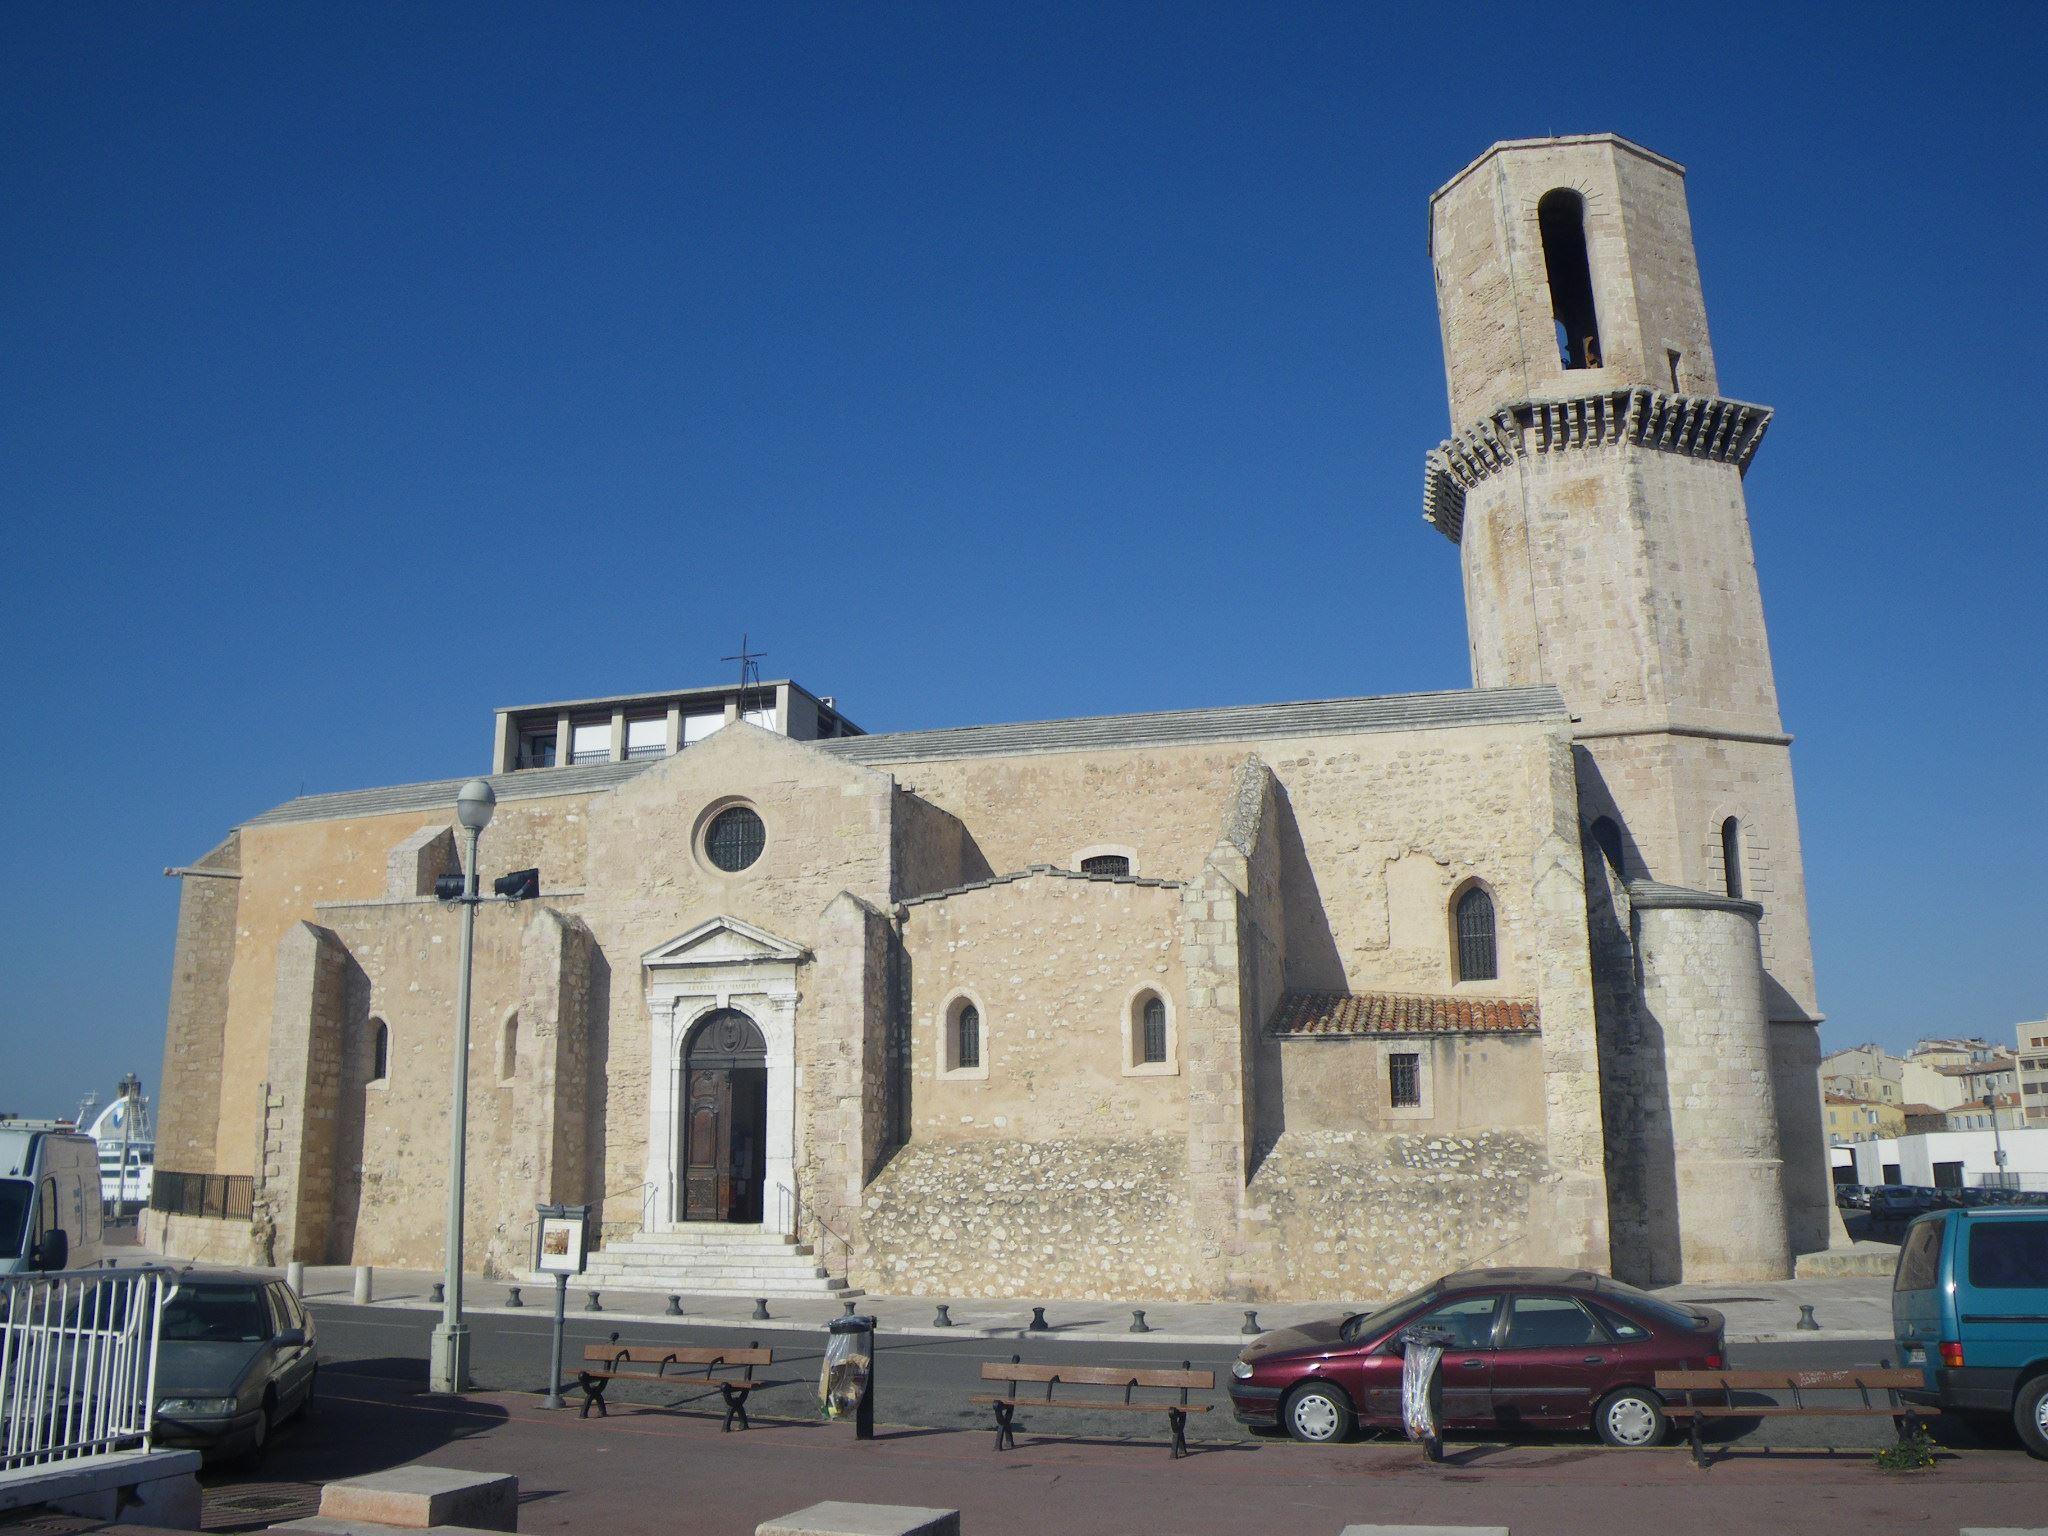 Le Vieux Marseille - quartier du Panier - The Old Town of Marseille (samedi/ only on saturday : bilingue GB/Fr)